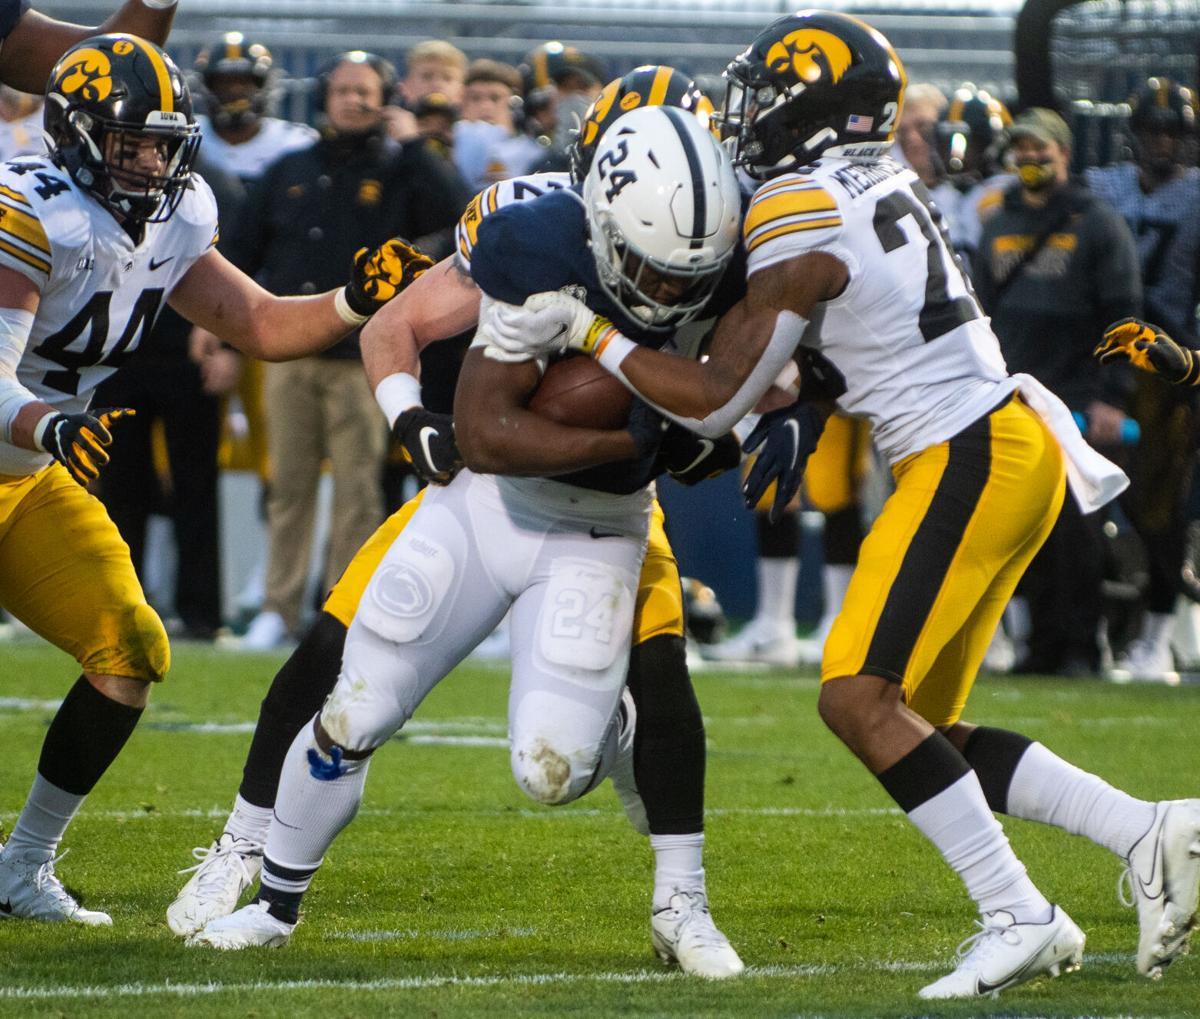 Football vs Iowa, Keyvone Lee (24) touchdown